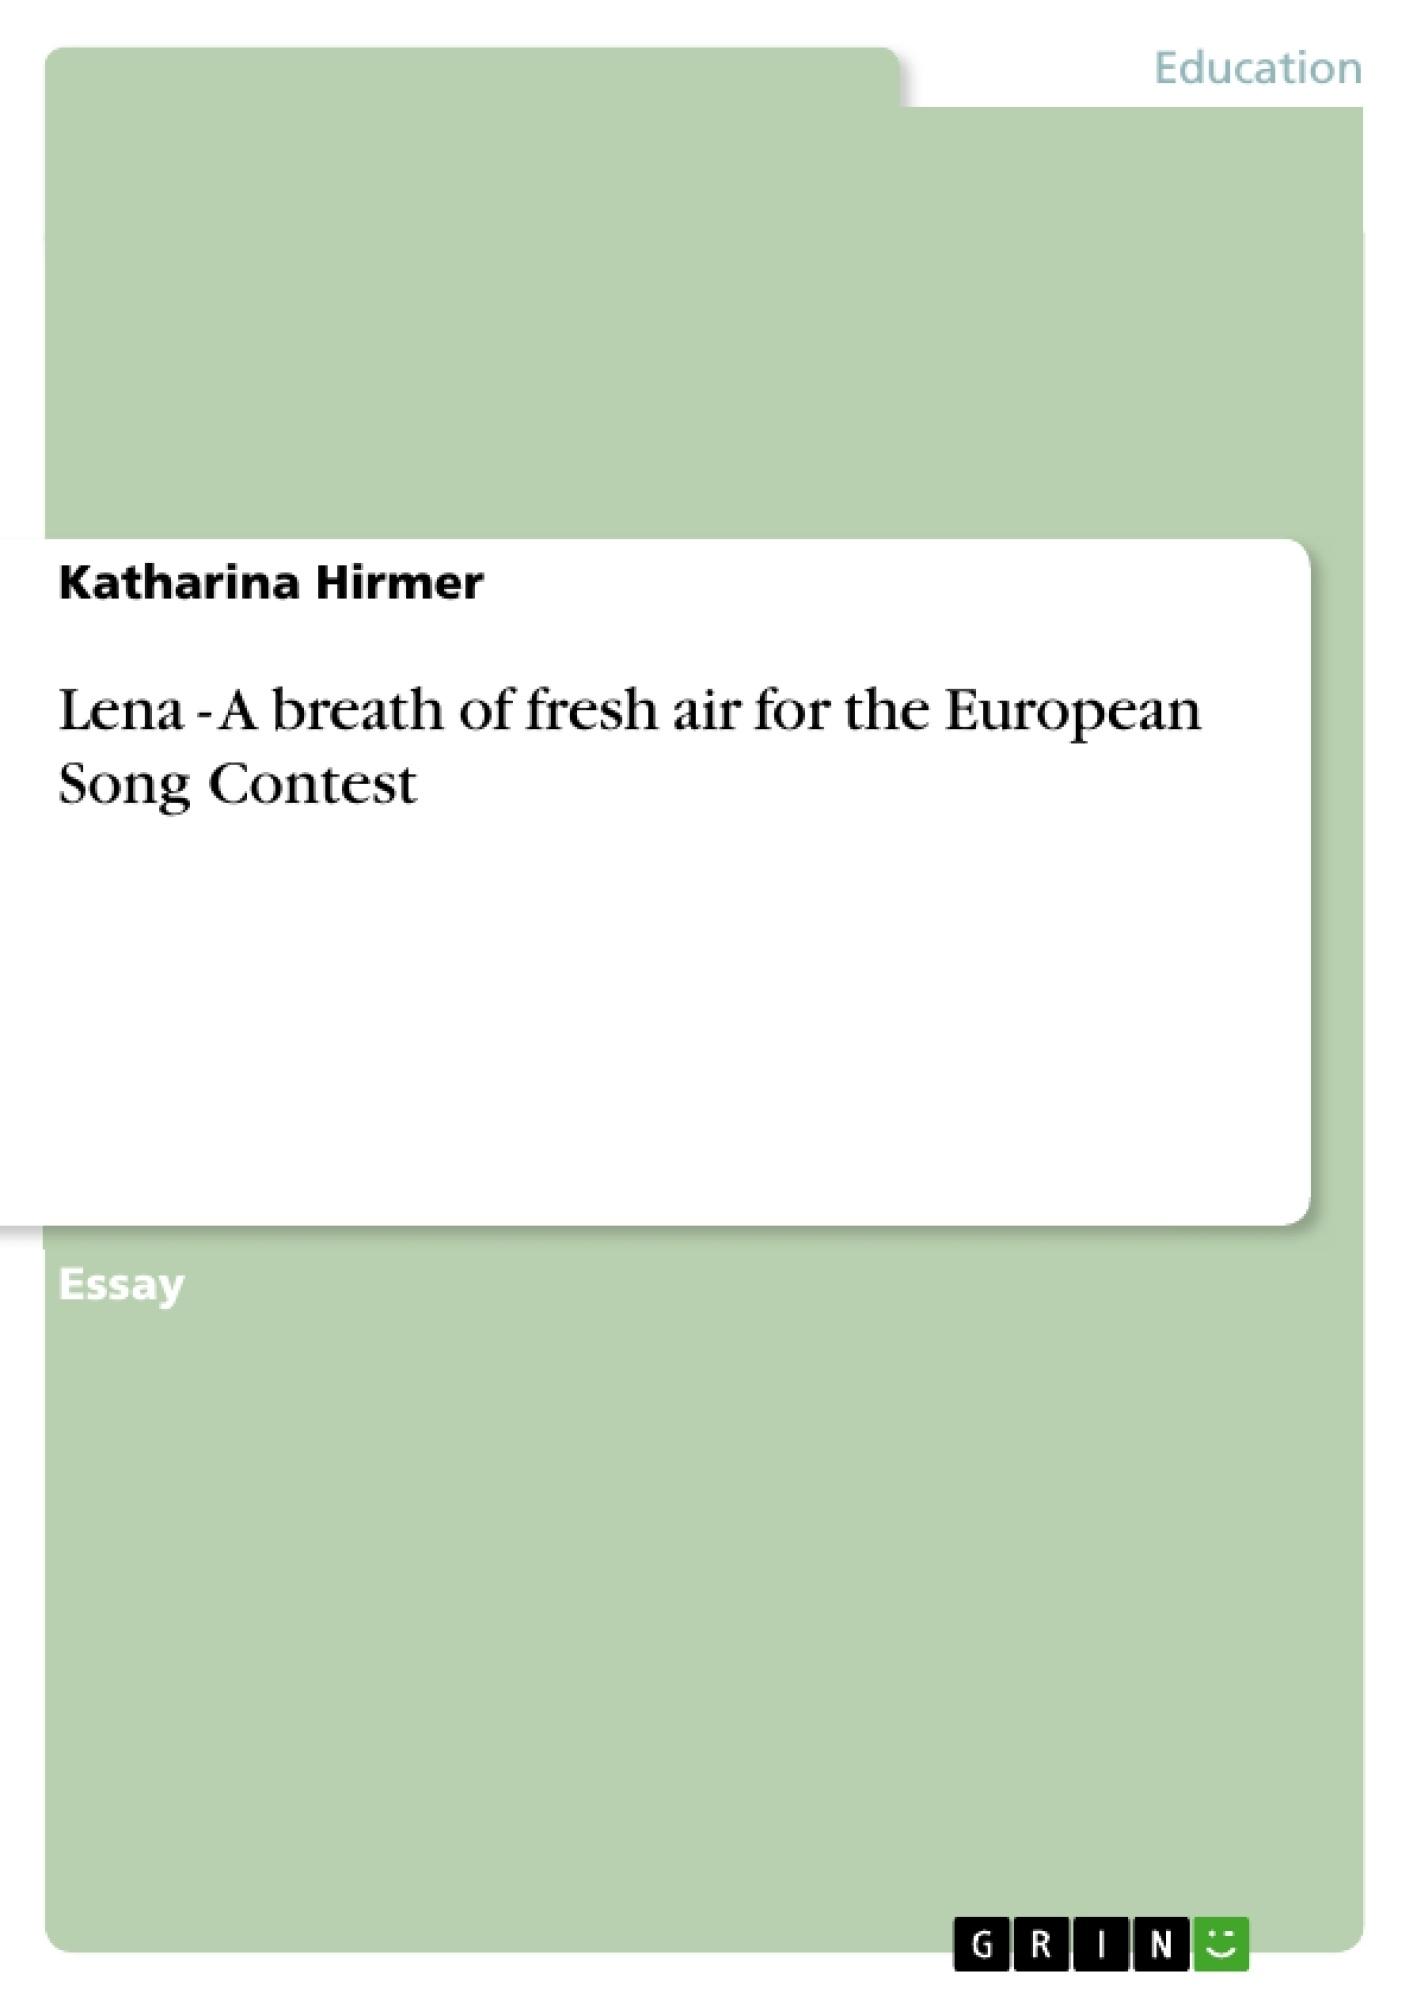 Title: Lena - A breath of fresh air for the European Song Contest